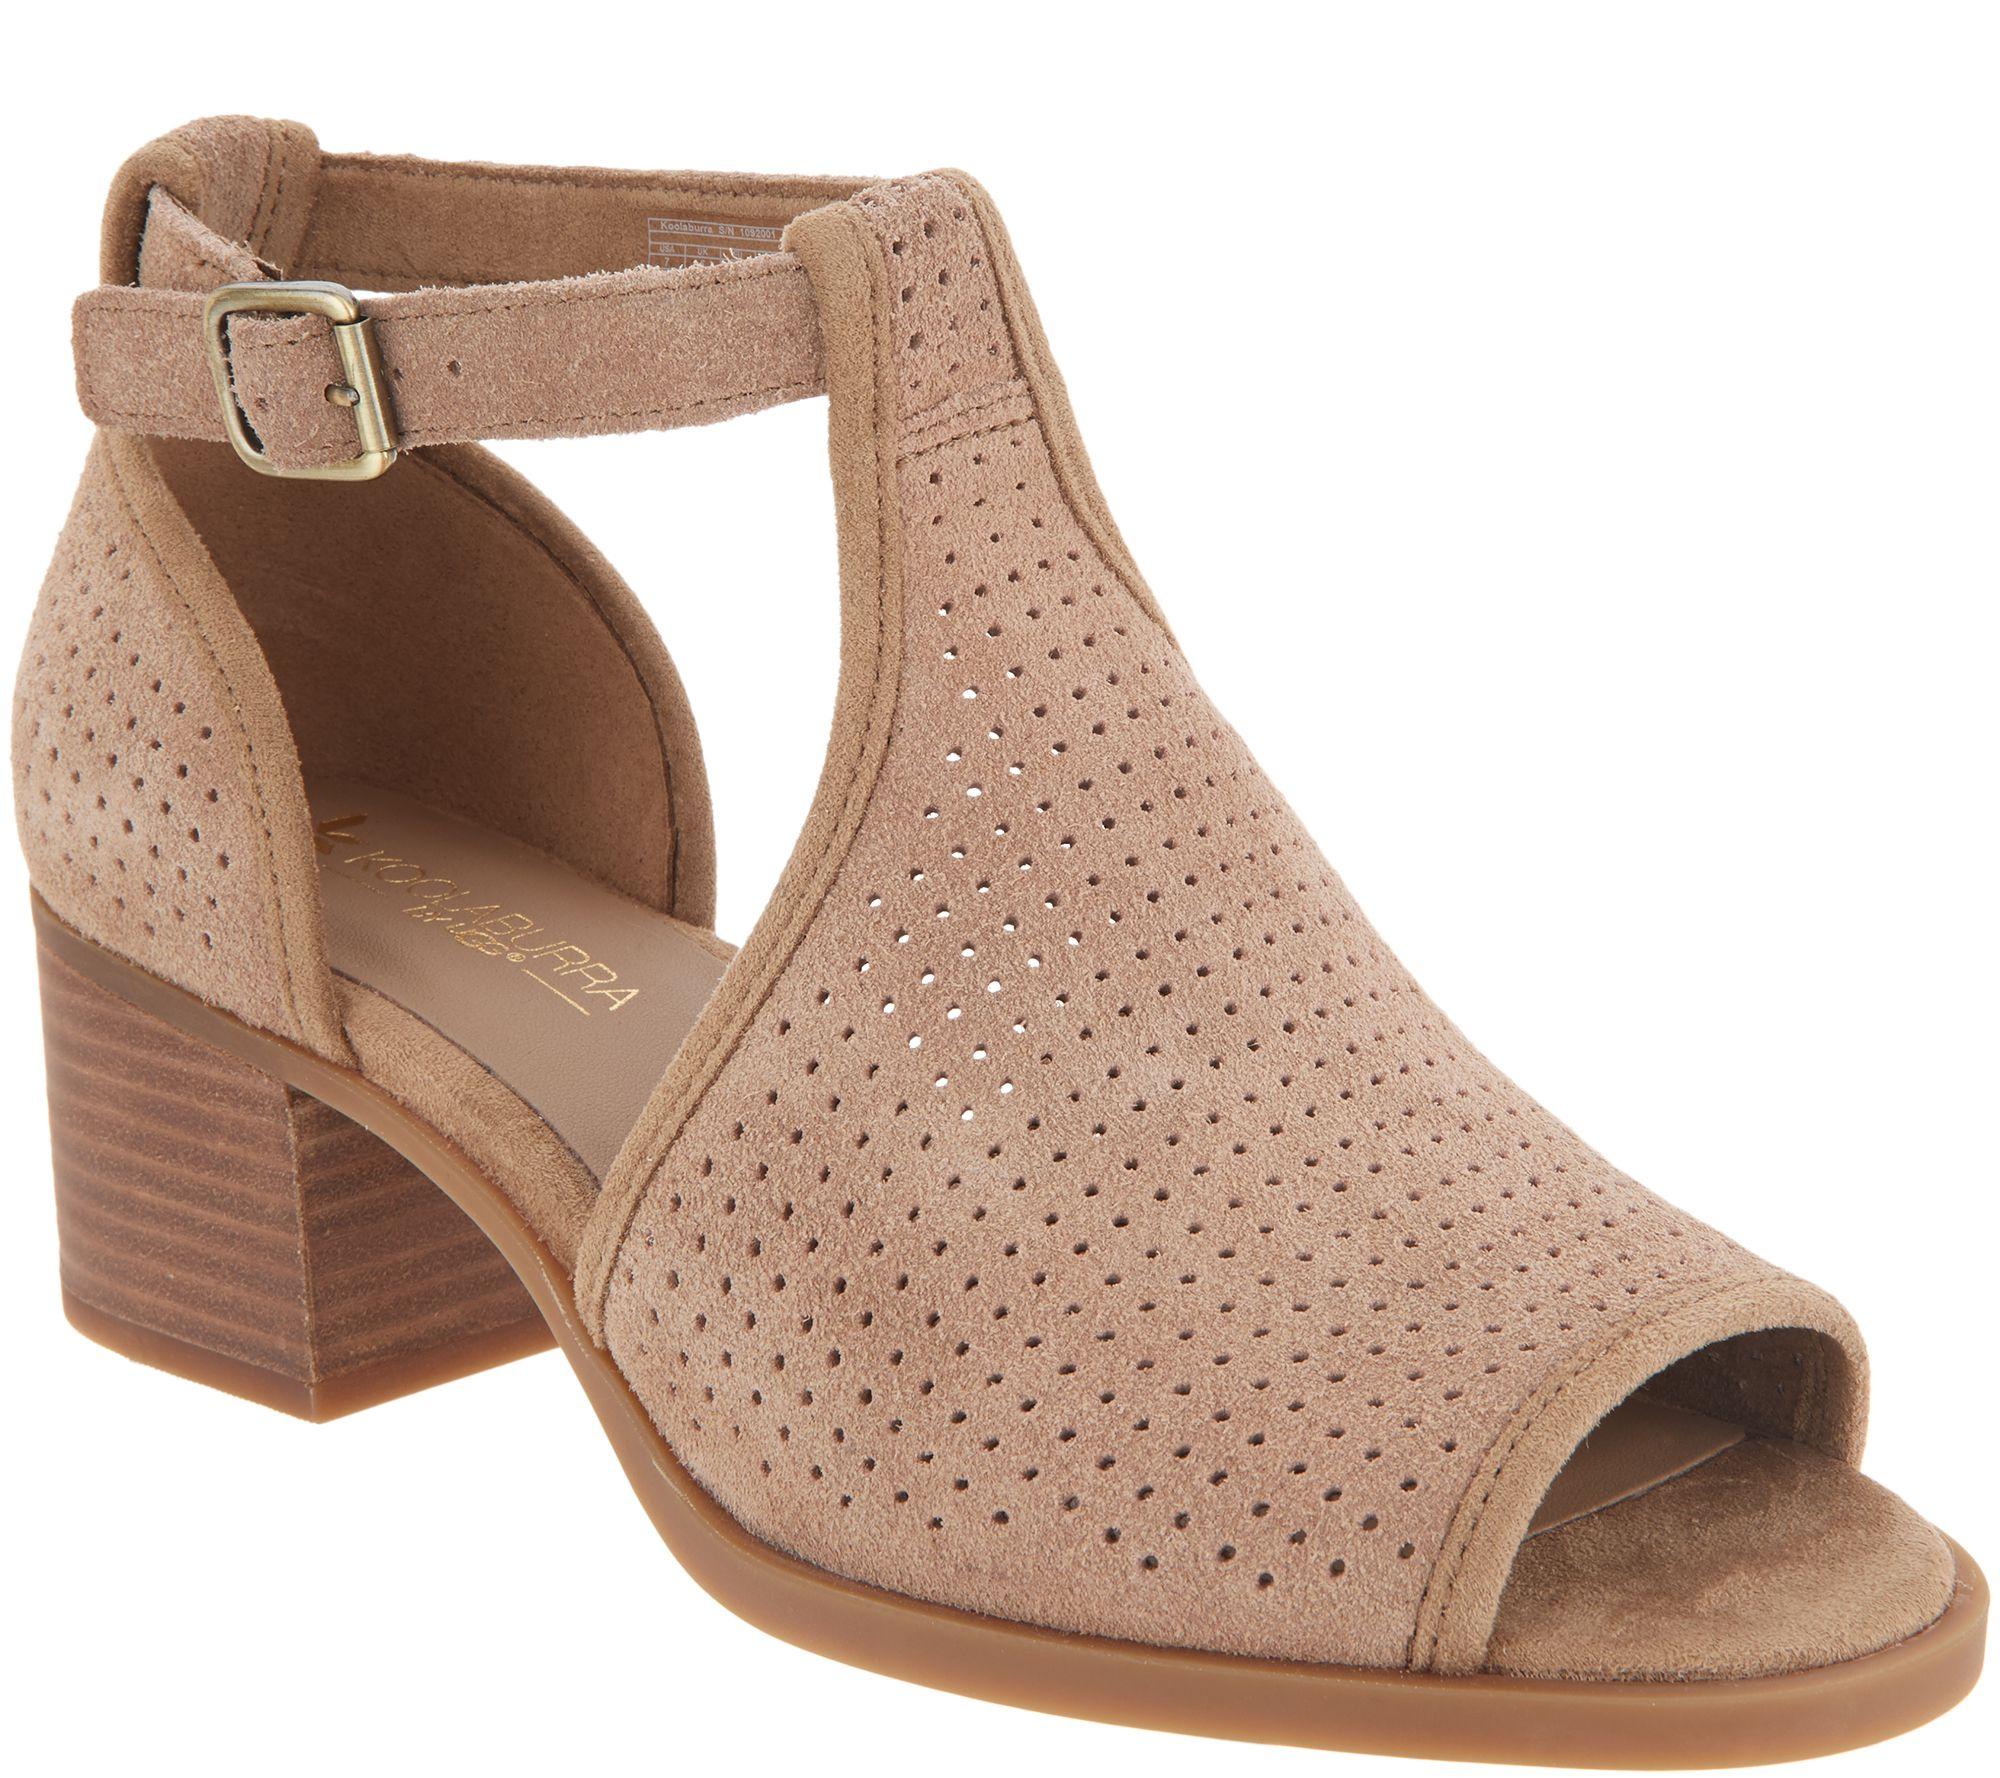 8d0903a70ac4b Koolaburra by UGG Perforated Suede Heeled Sandals -Ashlyn — QVC.com